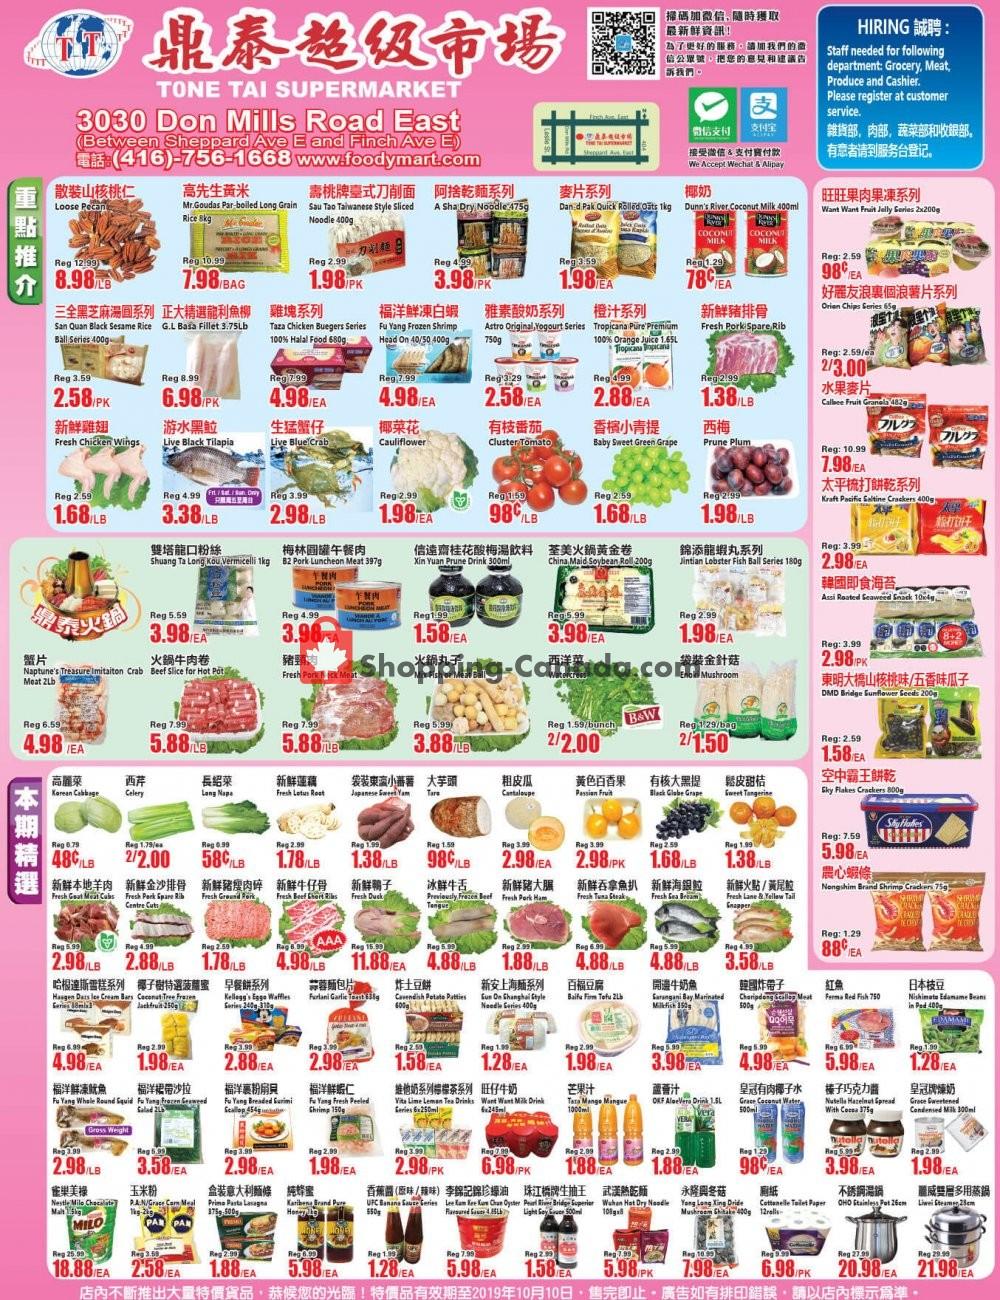 Flyer Tone Tai Supermarket Canada - from Friday October 4, 2019 to Thursday October 10, 2019